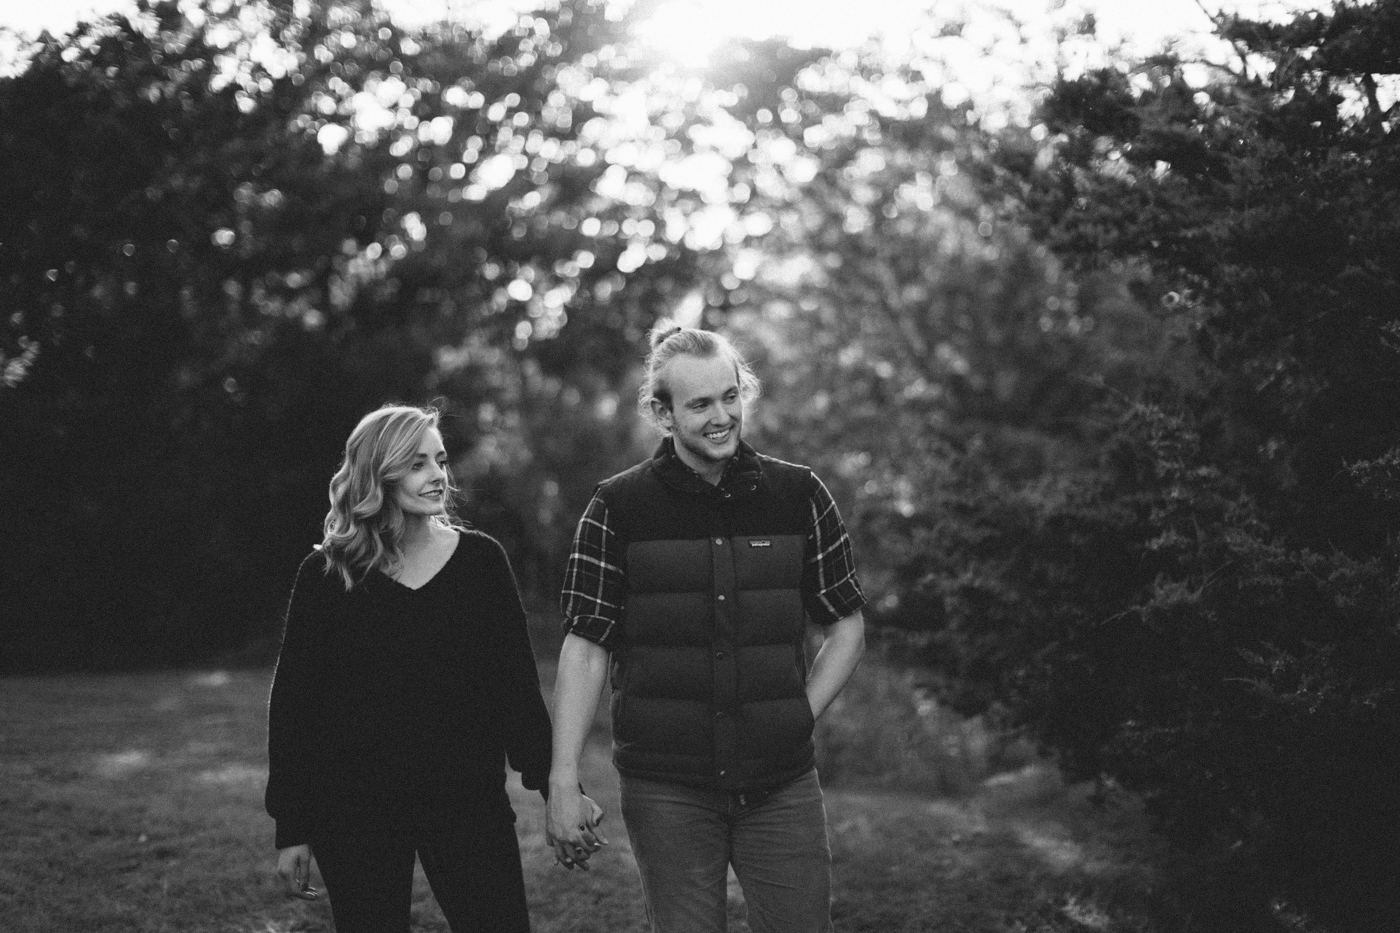 Sioux_Falls_Des_Moines_Engagement_Wedding_Photographer_16.jpg